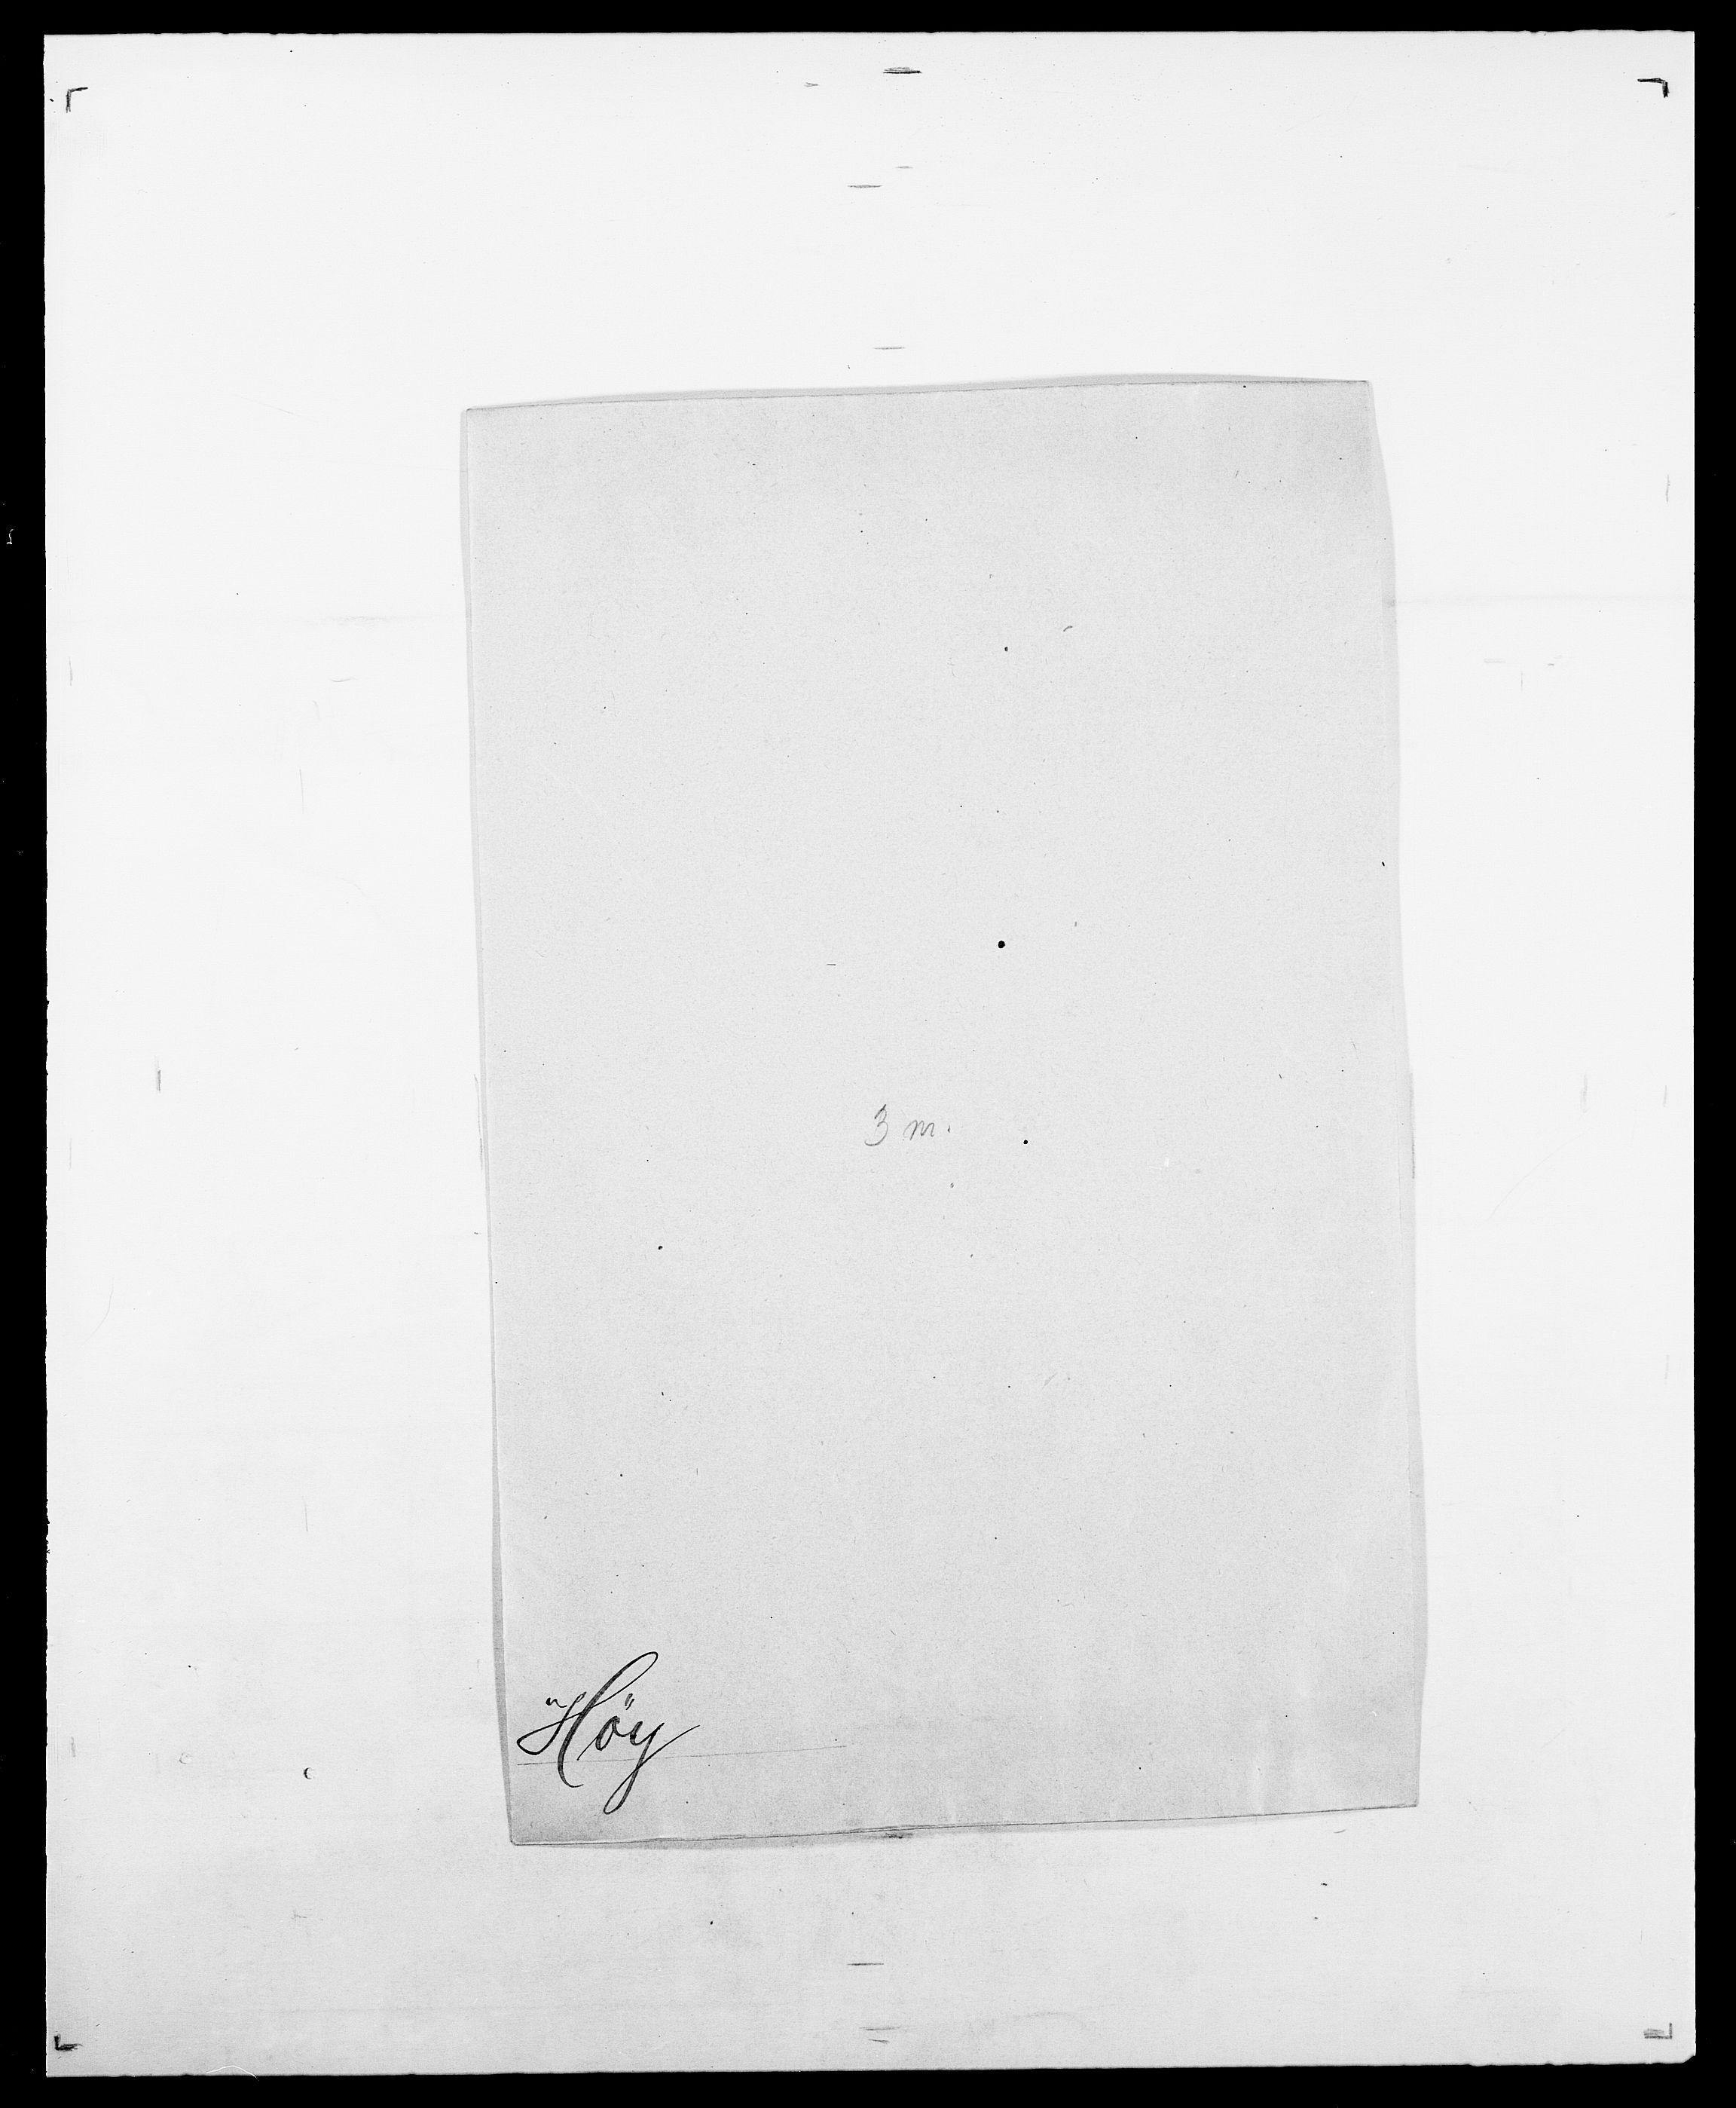 SAO, Delgobe, Charles Antoine - samling, D/Da/L0019: van der Hude - Joys, s. 402